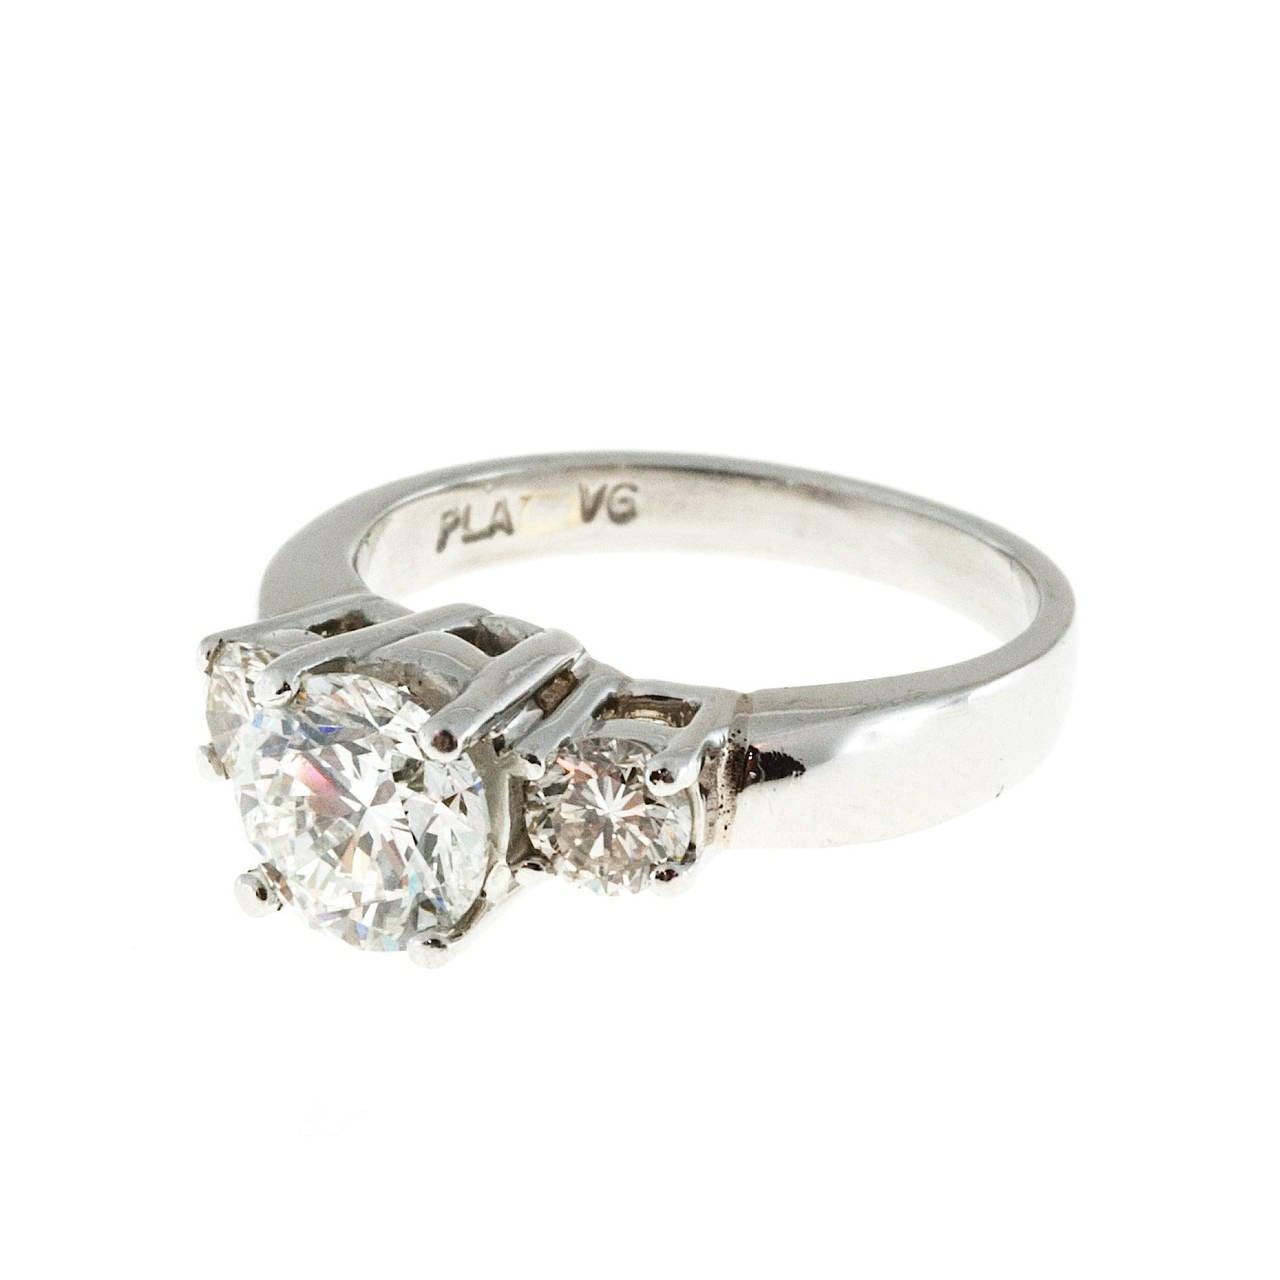 1.28 Carat GIA Cert Diamond Platinum Three Stone Engagement Ring